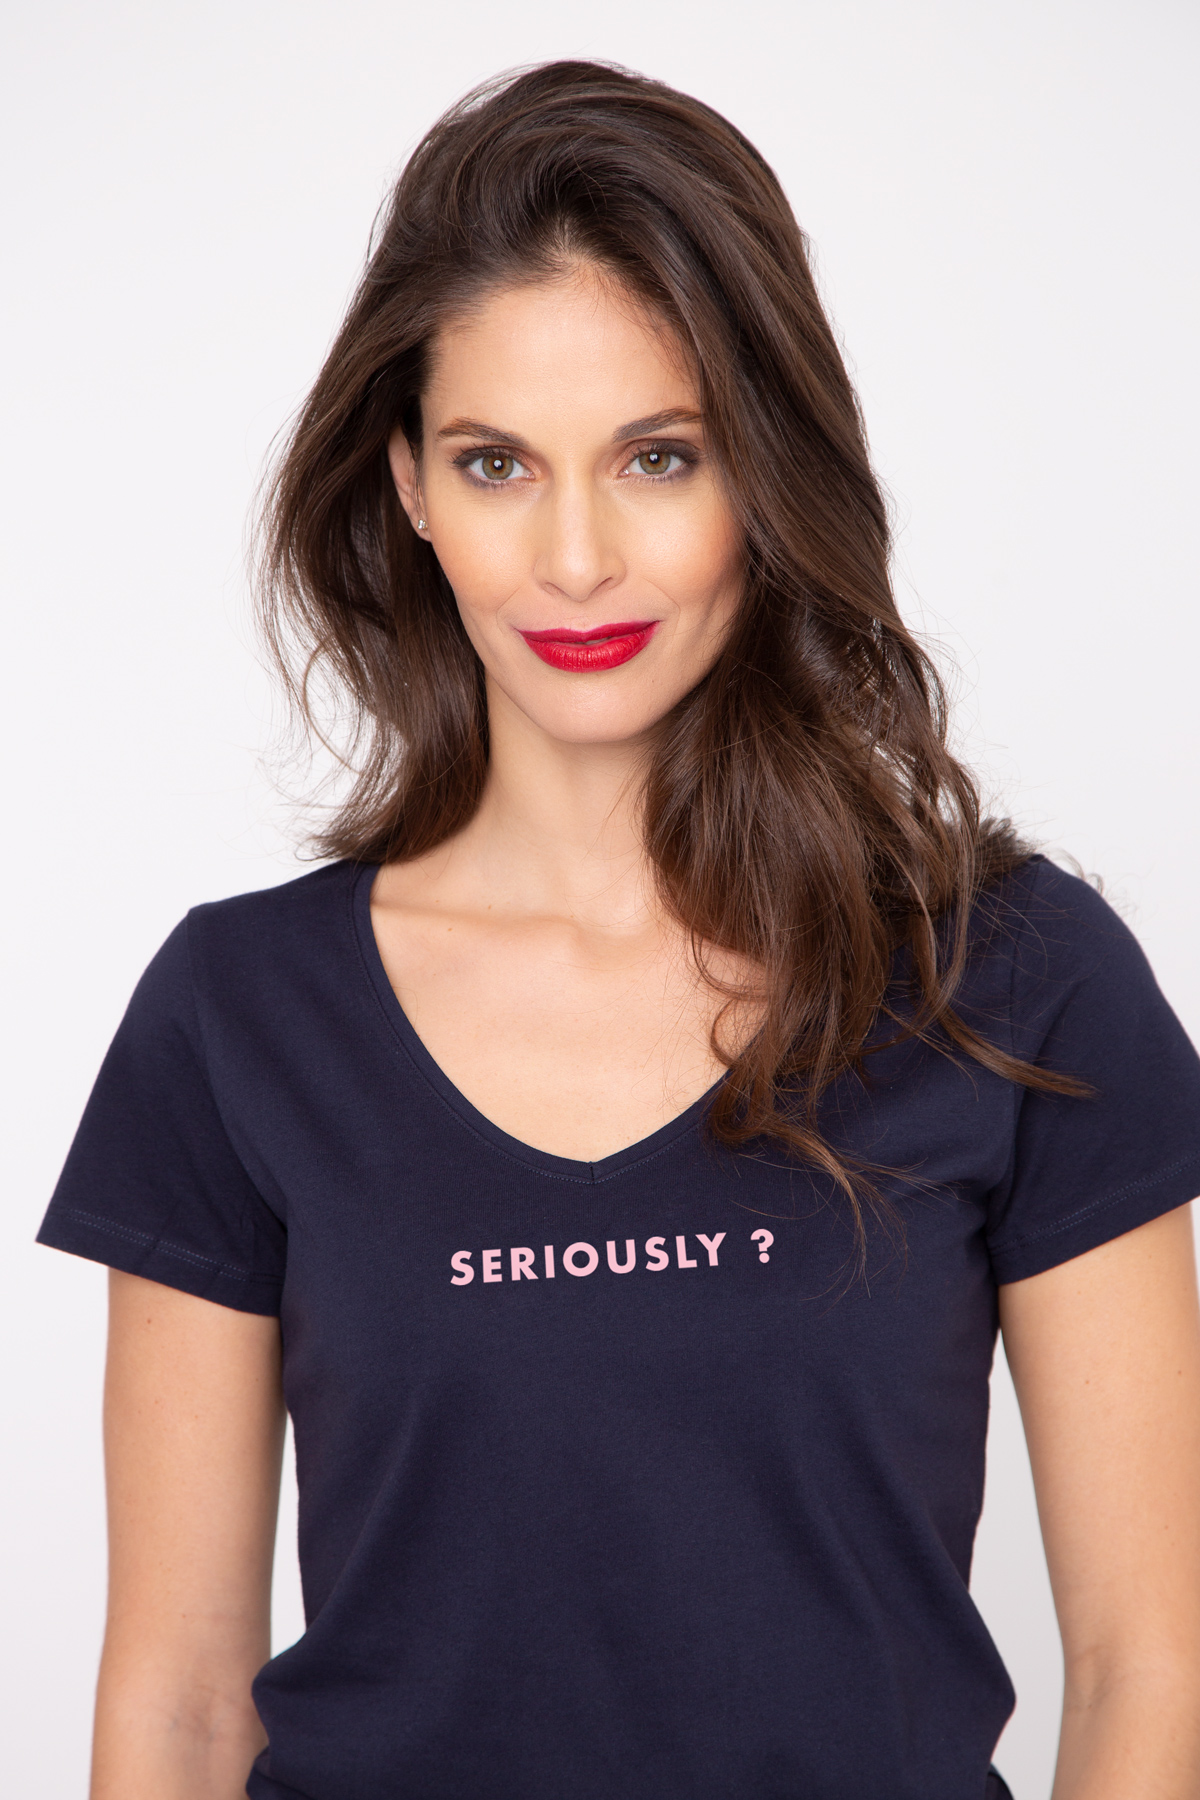 Photo de T-SHIRTS COL V Tshirt col V SERIOUSLY ? chez French Disorder